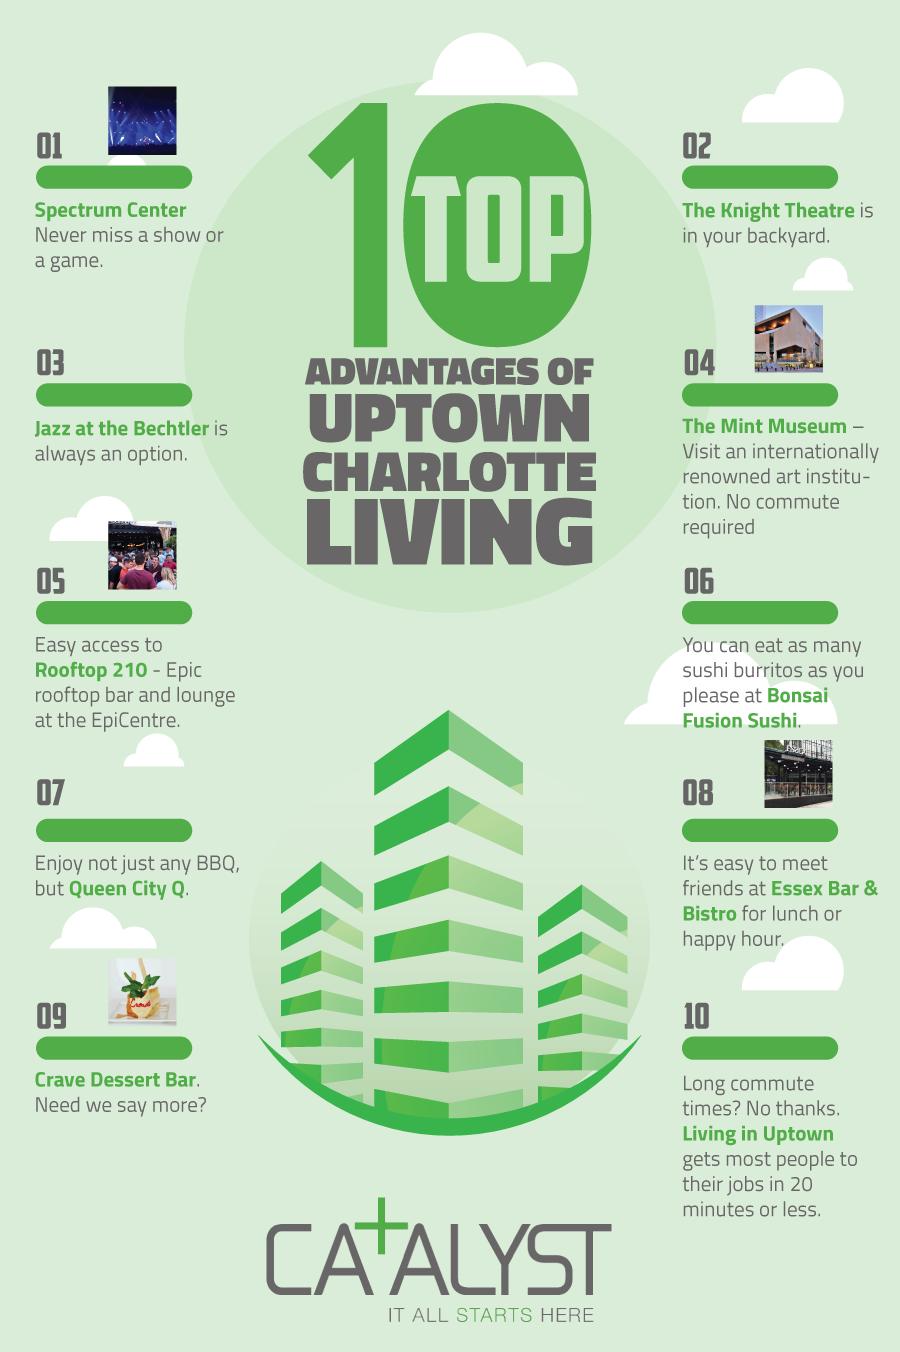 uptown charlotte living